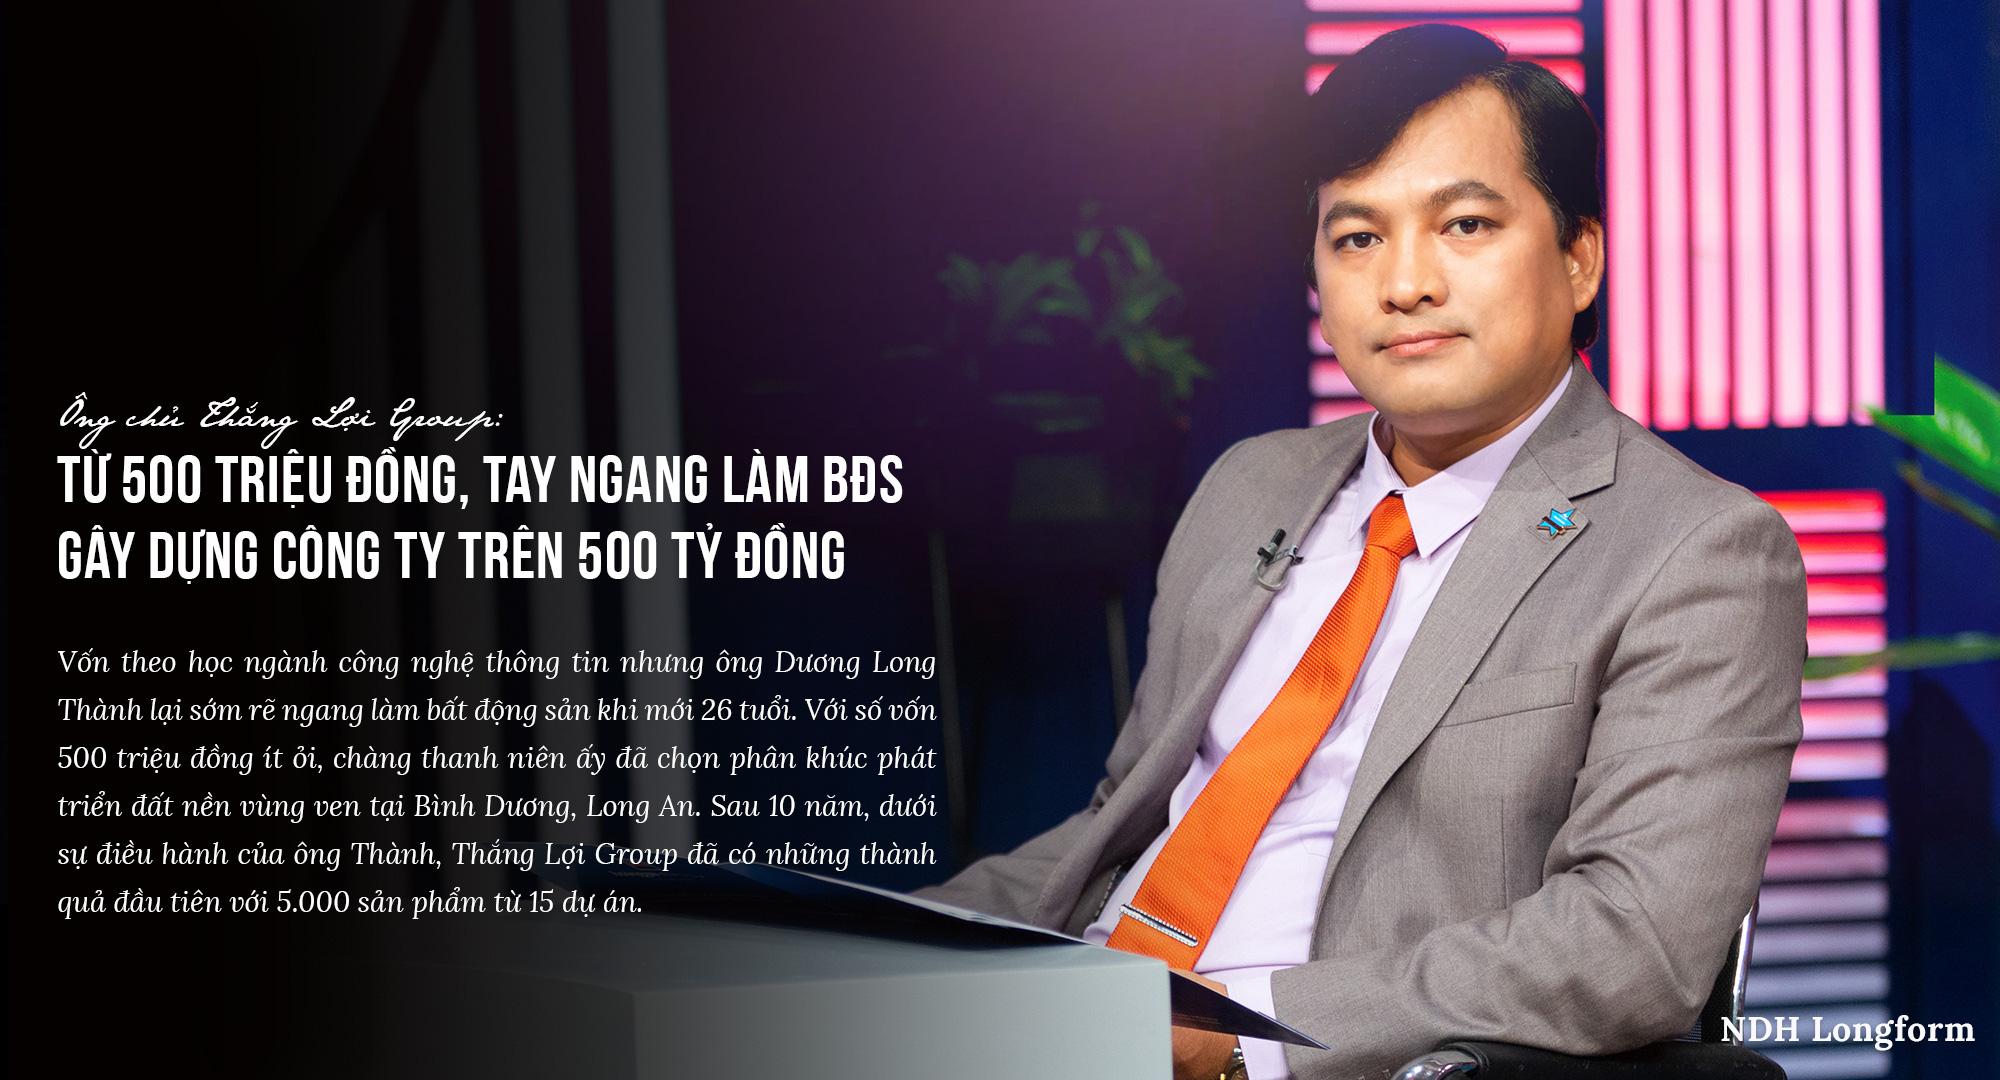 chu tich thang loi group